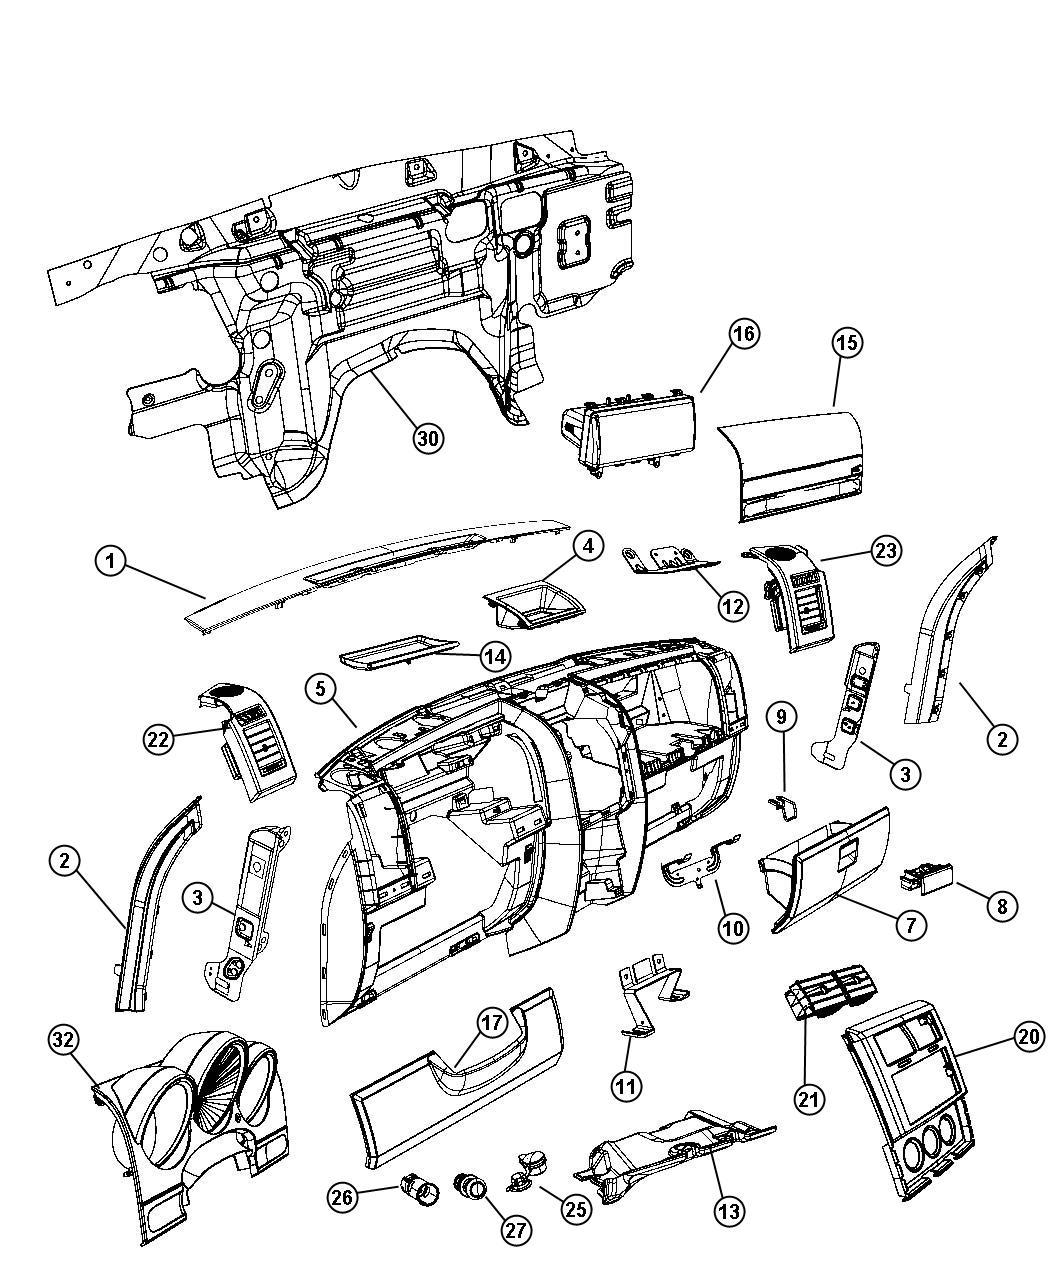 Dodge Nitro Panel Closeout Right Instrument Structure